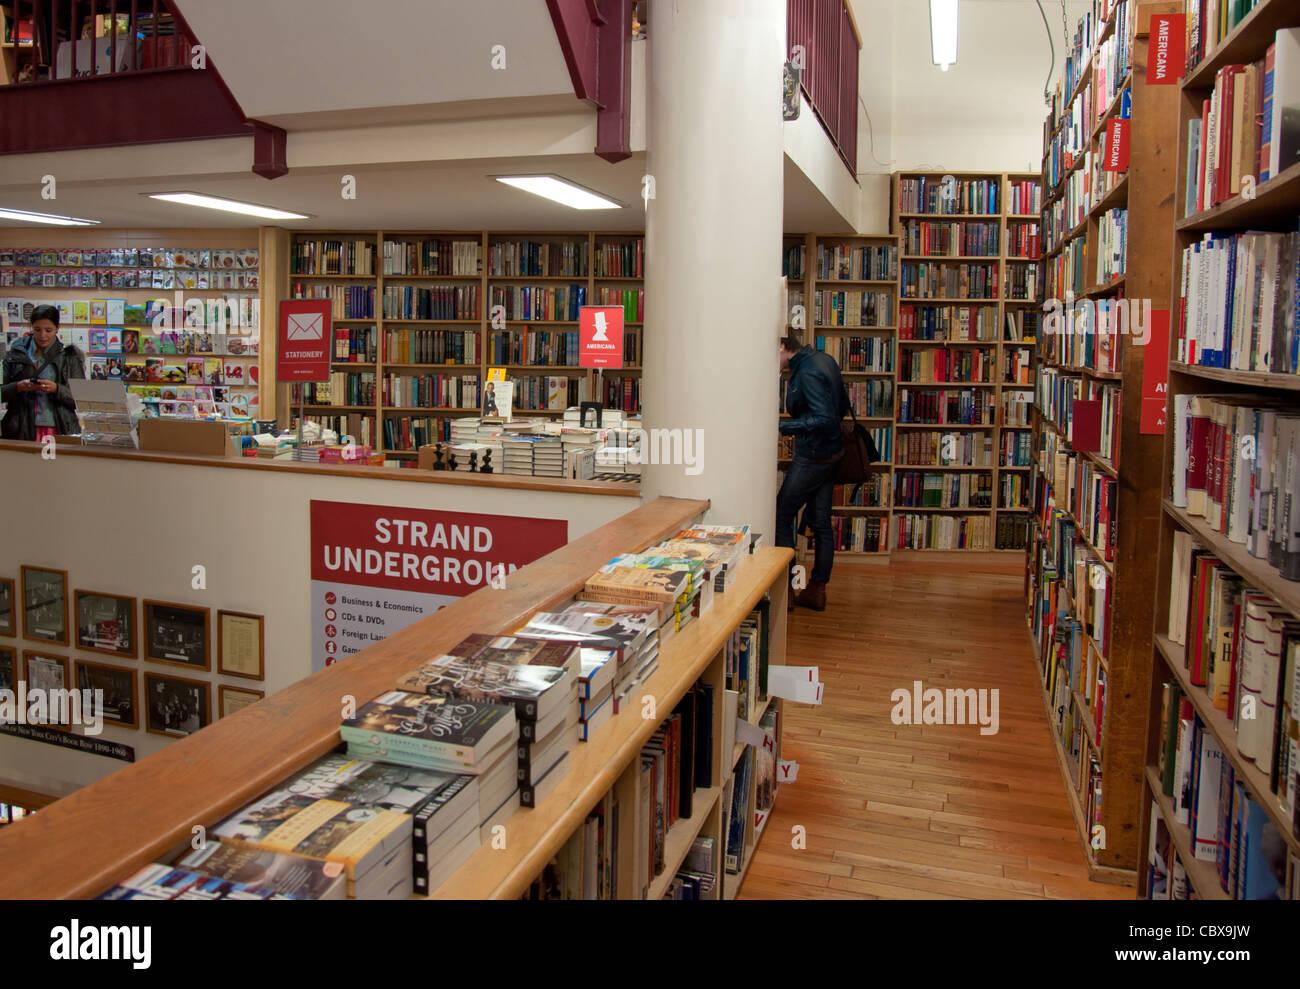 Strand Famous Bookstore on 828 Broadway, Manhattan (New York City) Stock Photo